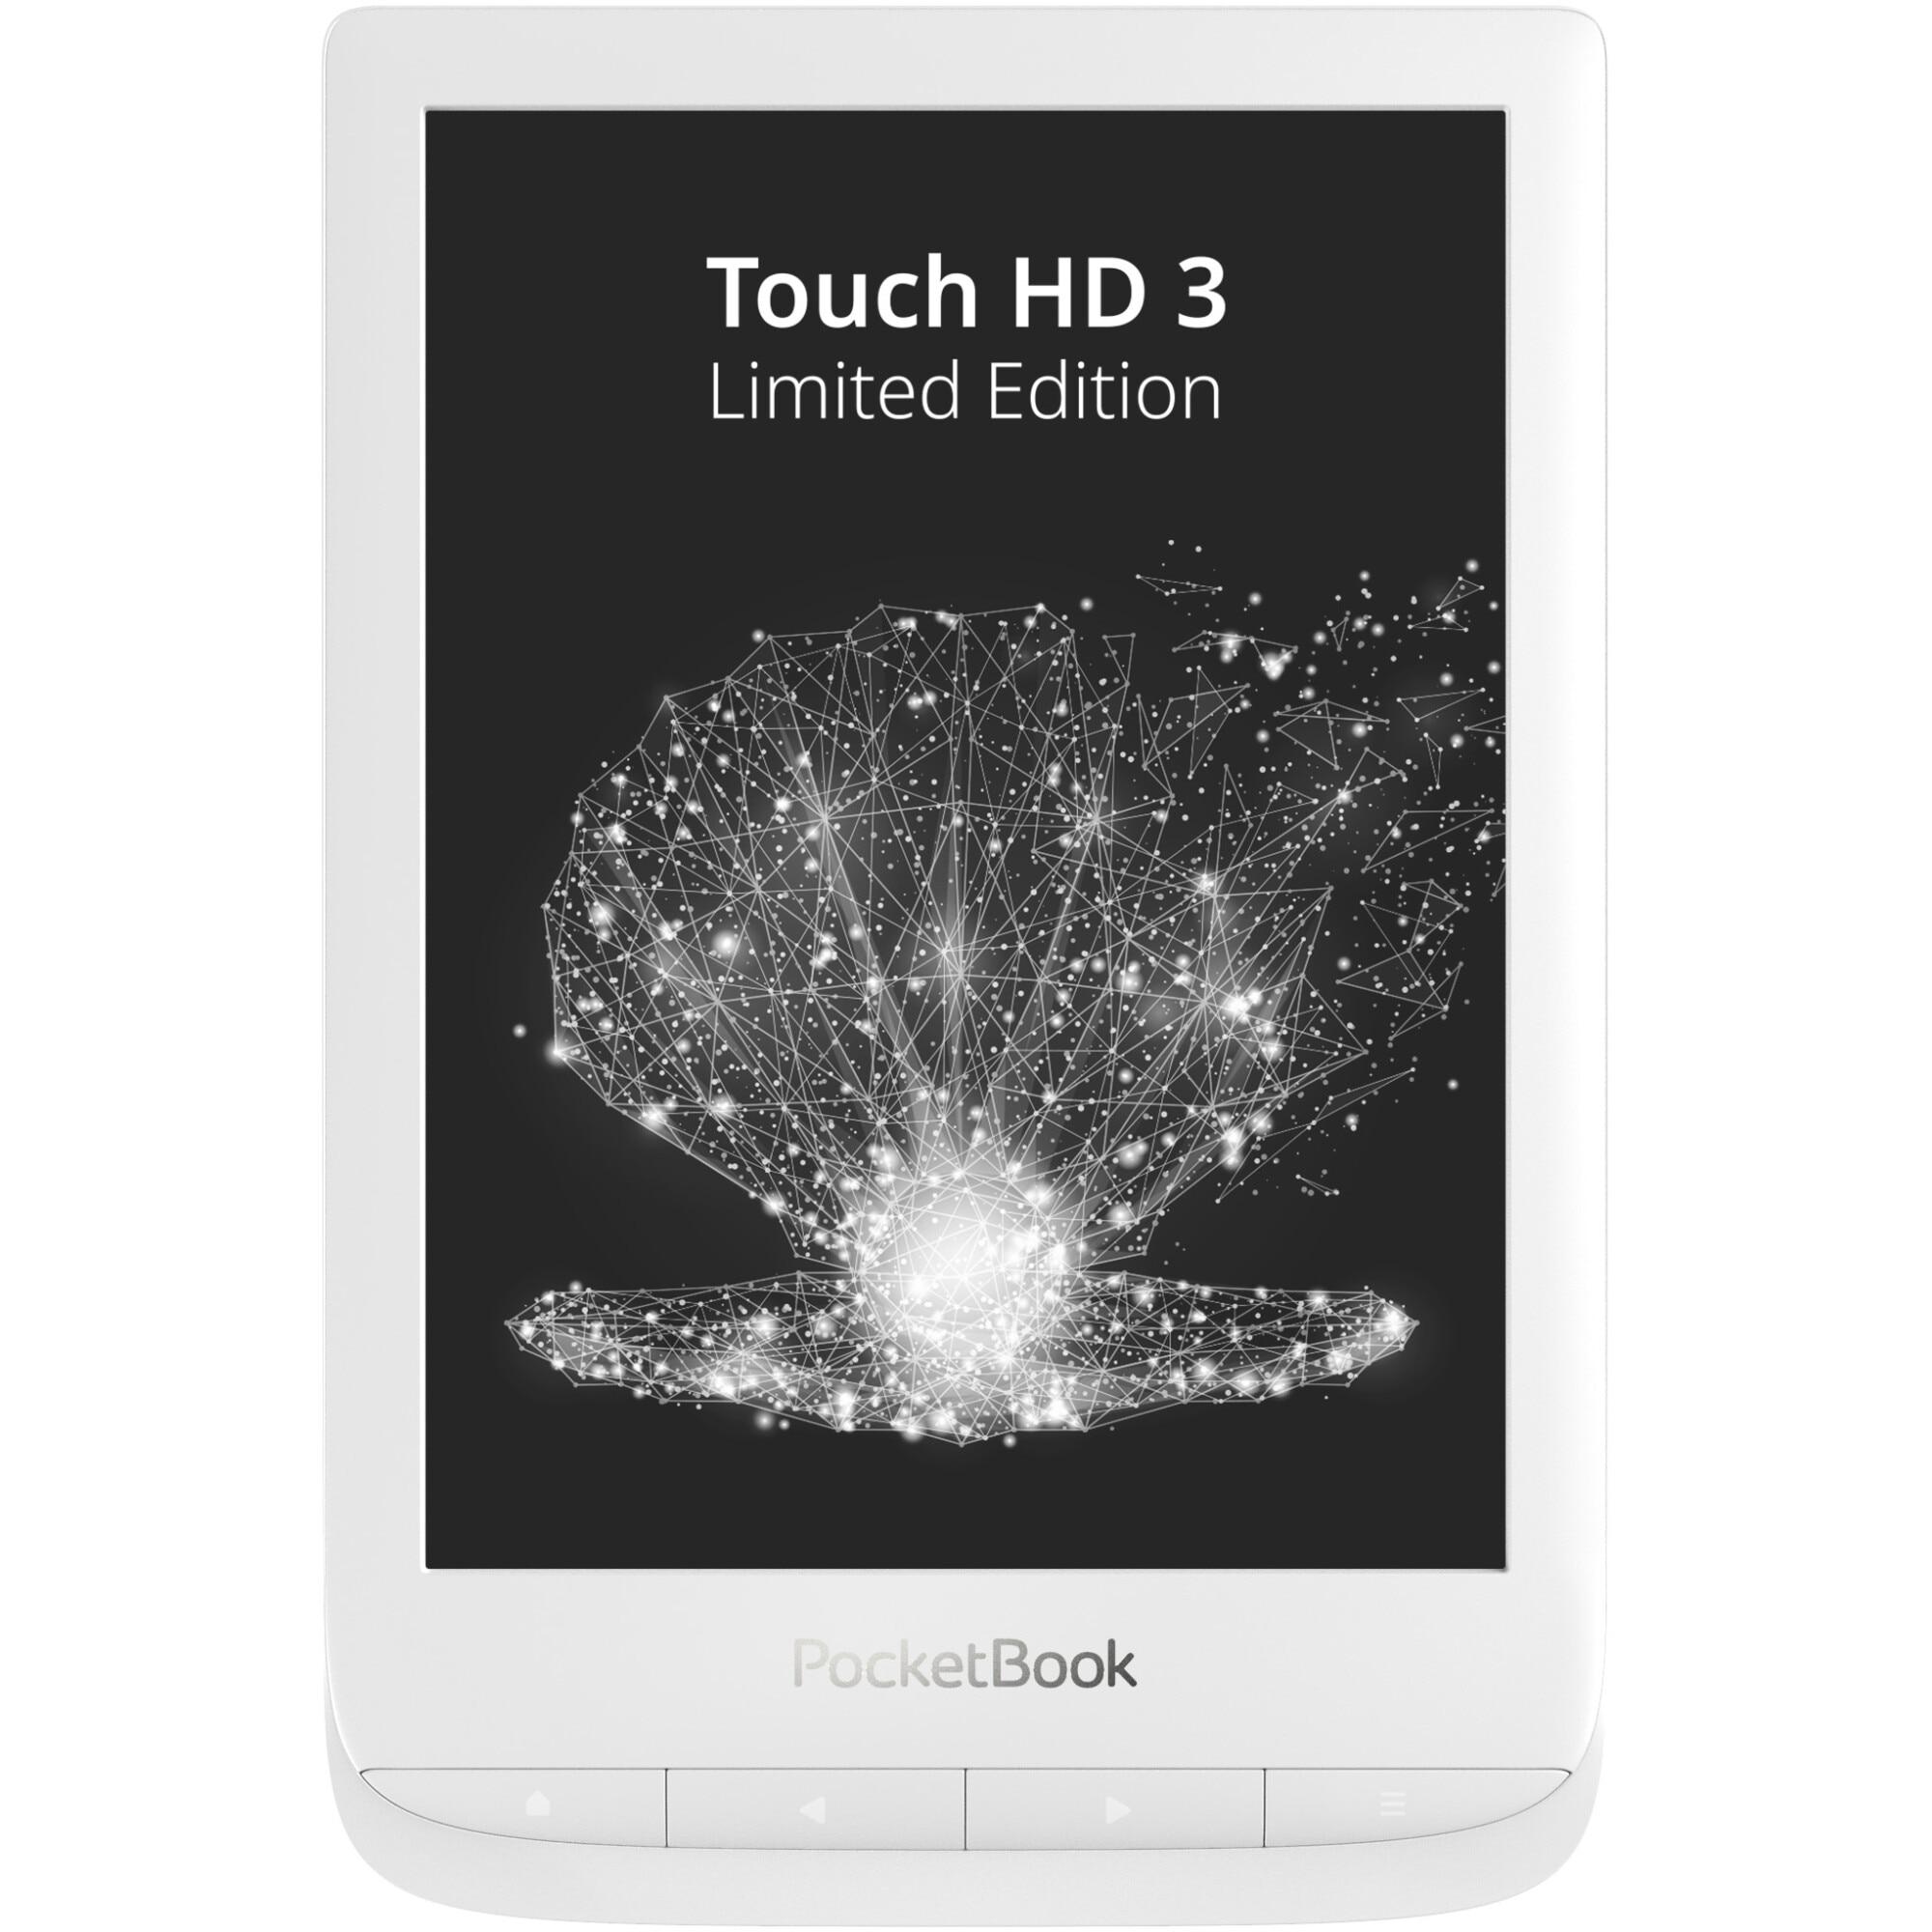 "Fotografie eBook Reader PocketBook Touch HD3 LIMITED EDITION, 6"", 16GB, rezistent la apa, WiFi, Bluetooth, husa, Alb perlat"